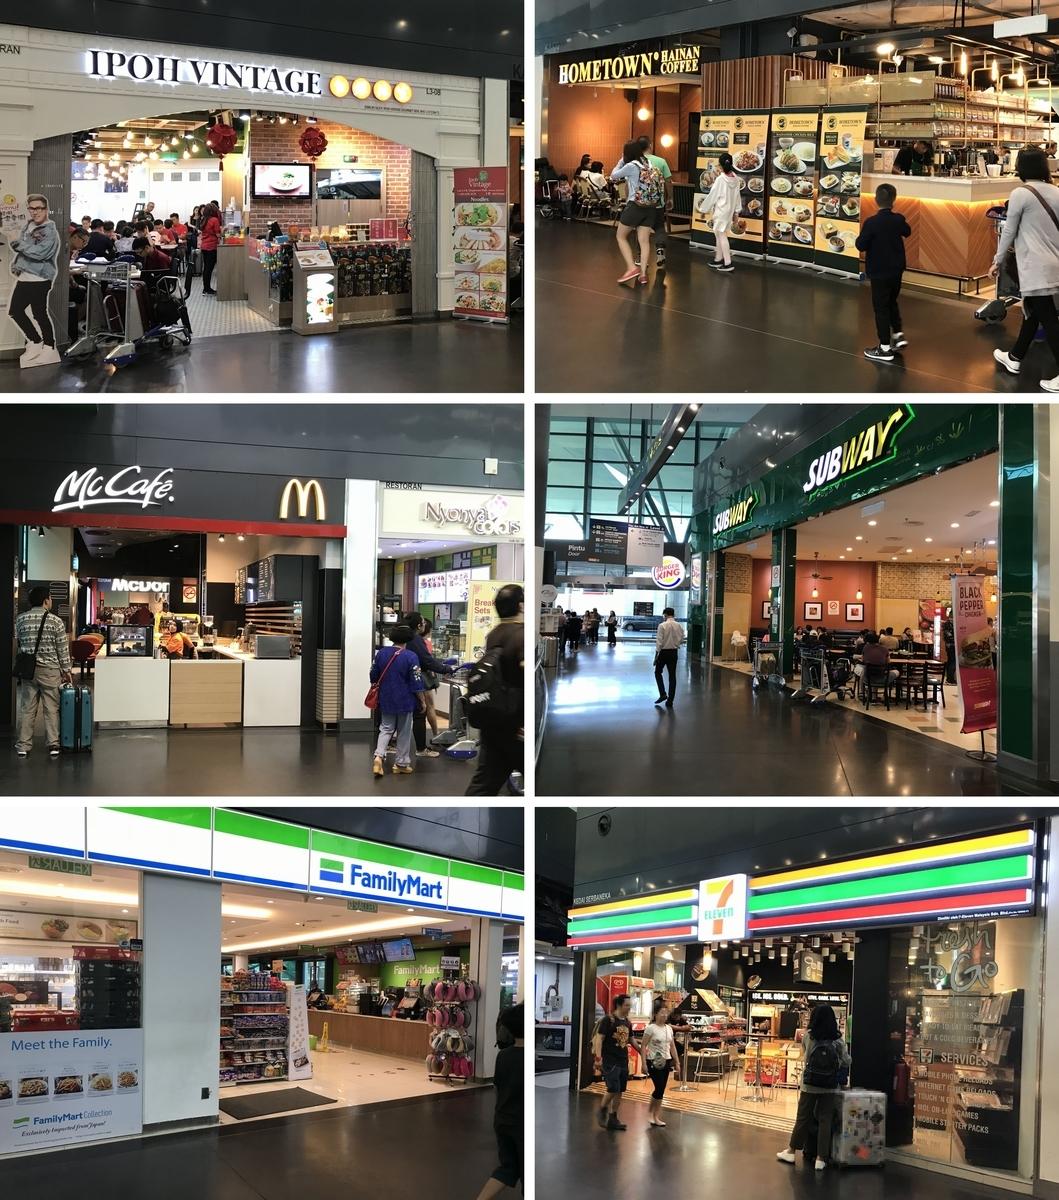 f:id:Nagoya1976:20191104103529j:plain